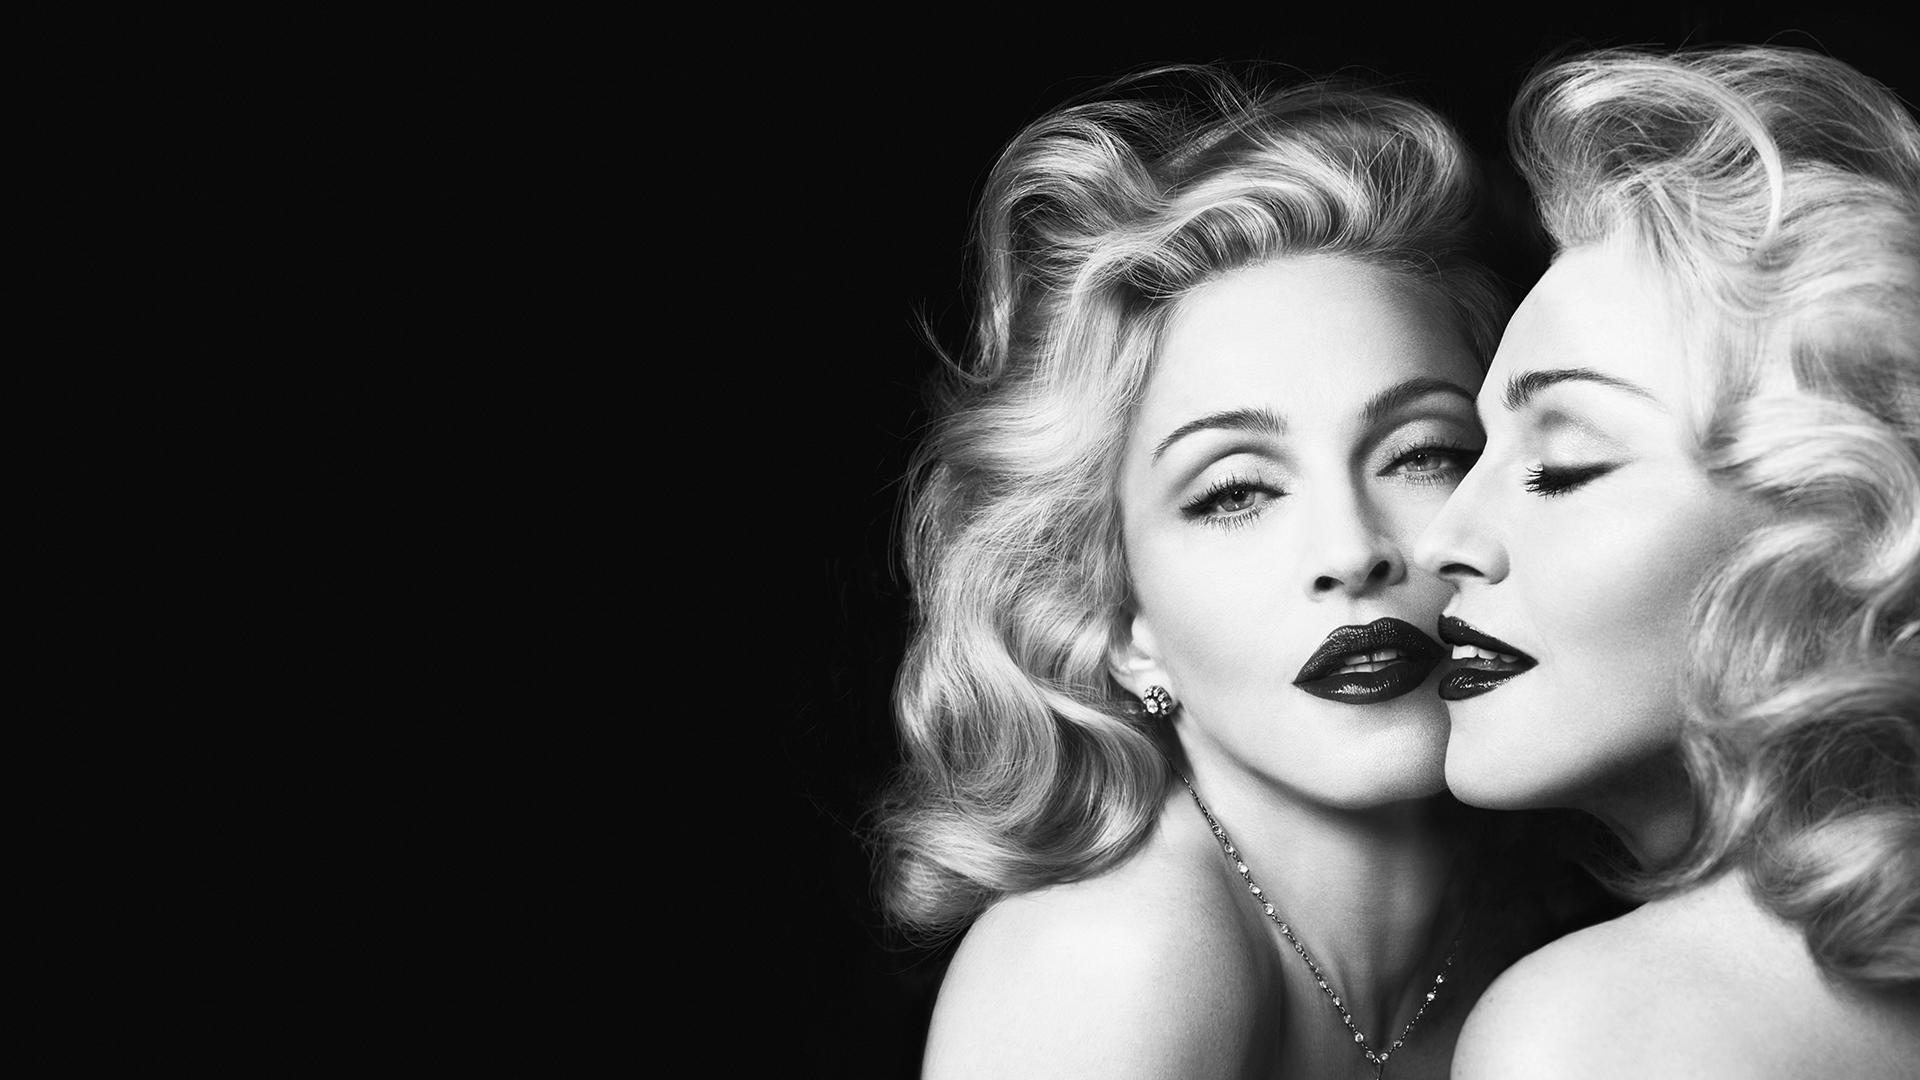 Madonna hd wallpaper background image 1920x1080 id 545514 wallpaper abyss - Madonna hd images ...